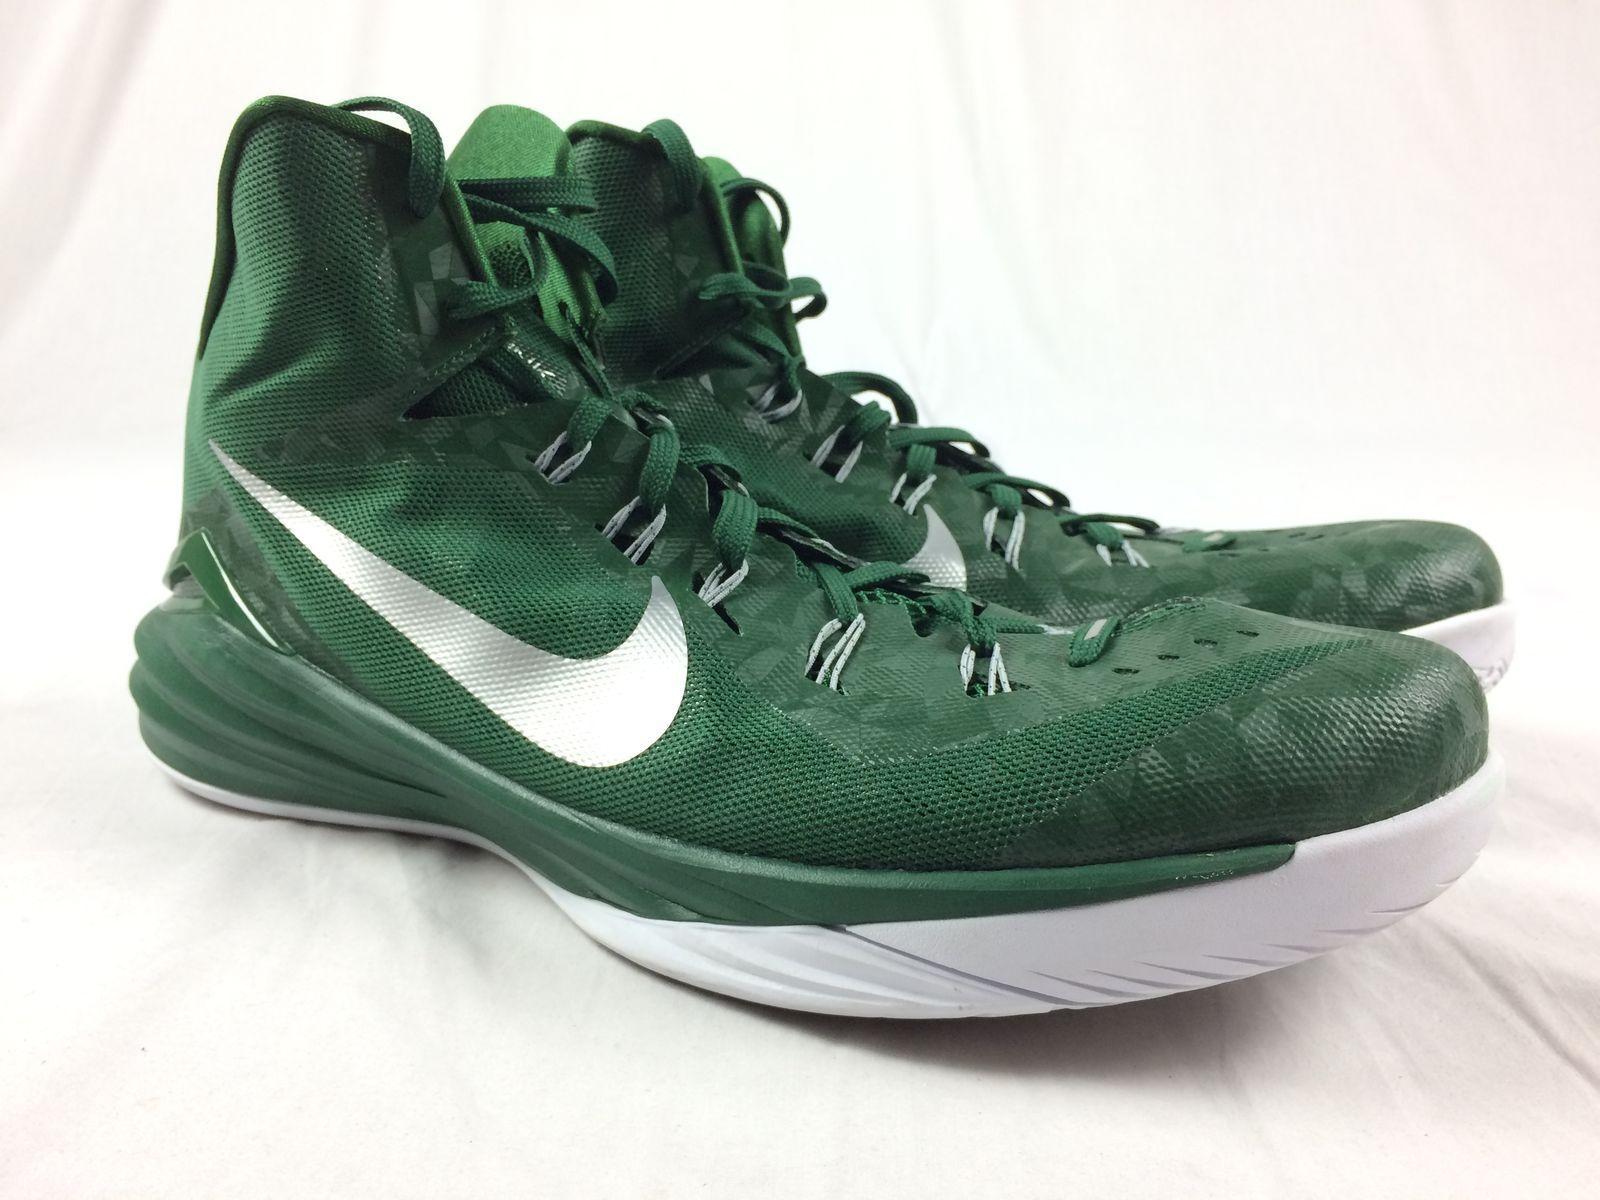 Nuove nike hyperdunk - green scarpe da basket (uomini e 18)